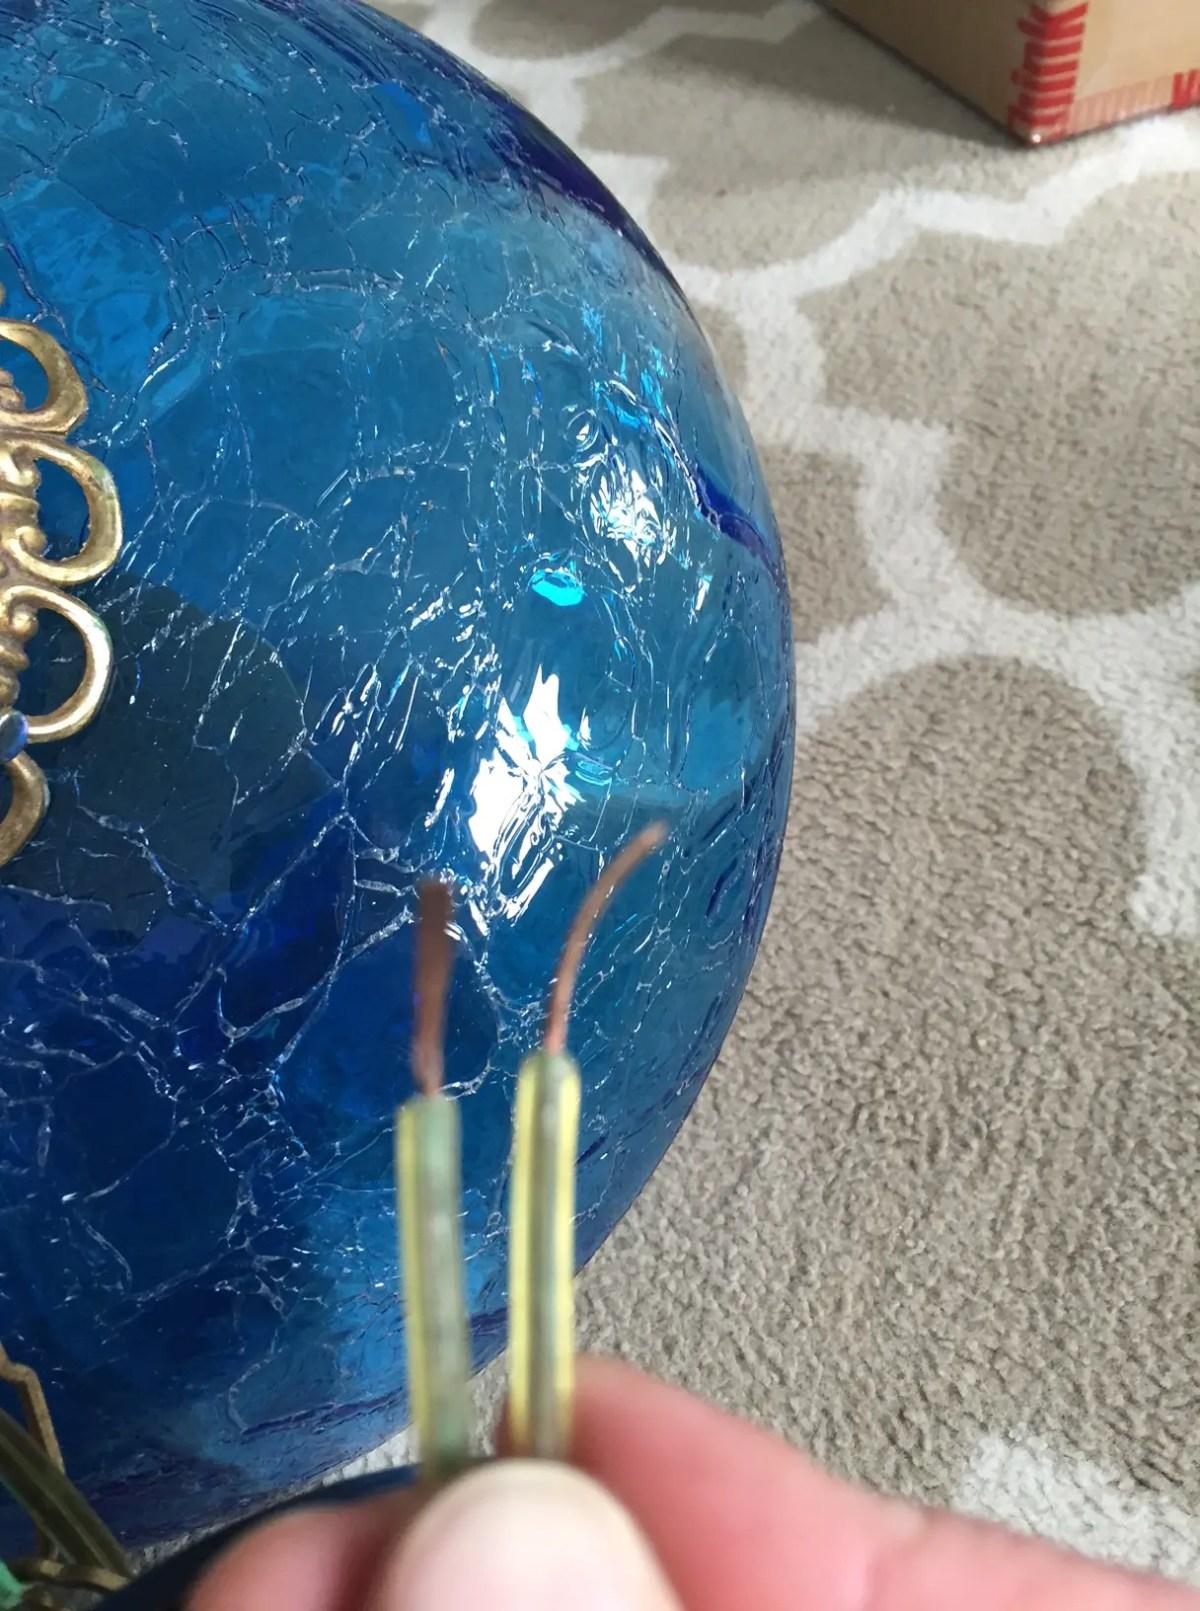 Blue glass Tiffany lamp